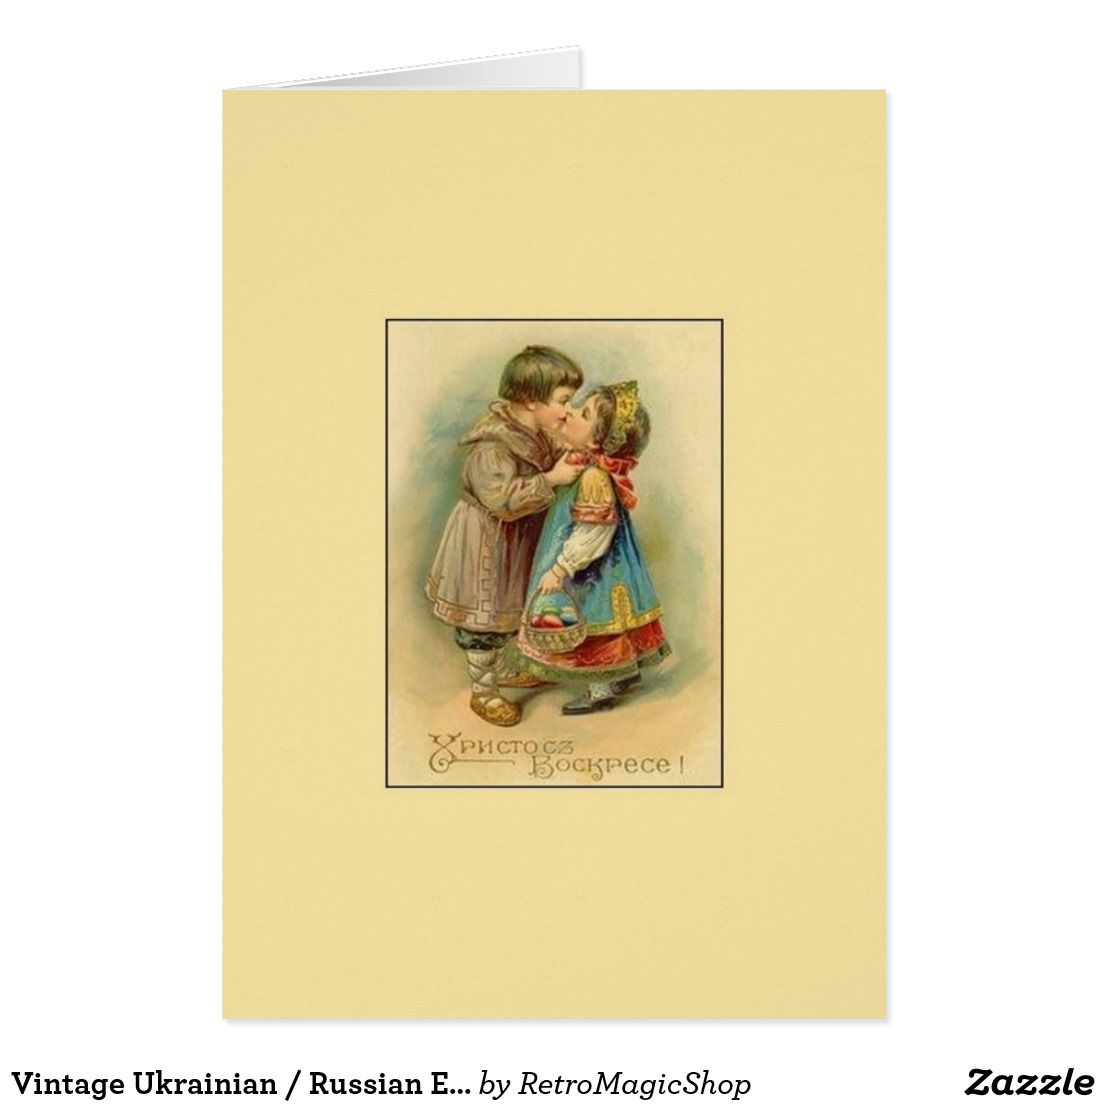 Vintage ukrainian russian easter greeting card vintage vintage ukrainian russian easter greeting card m4hsunfo